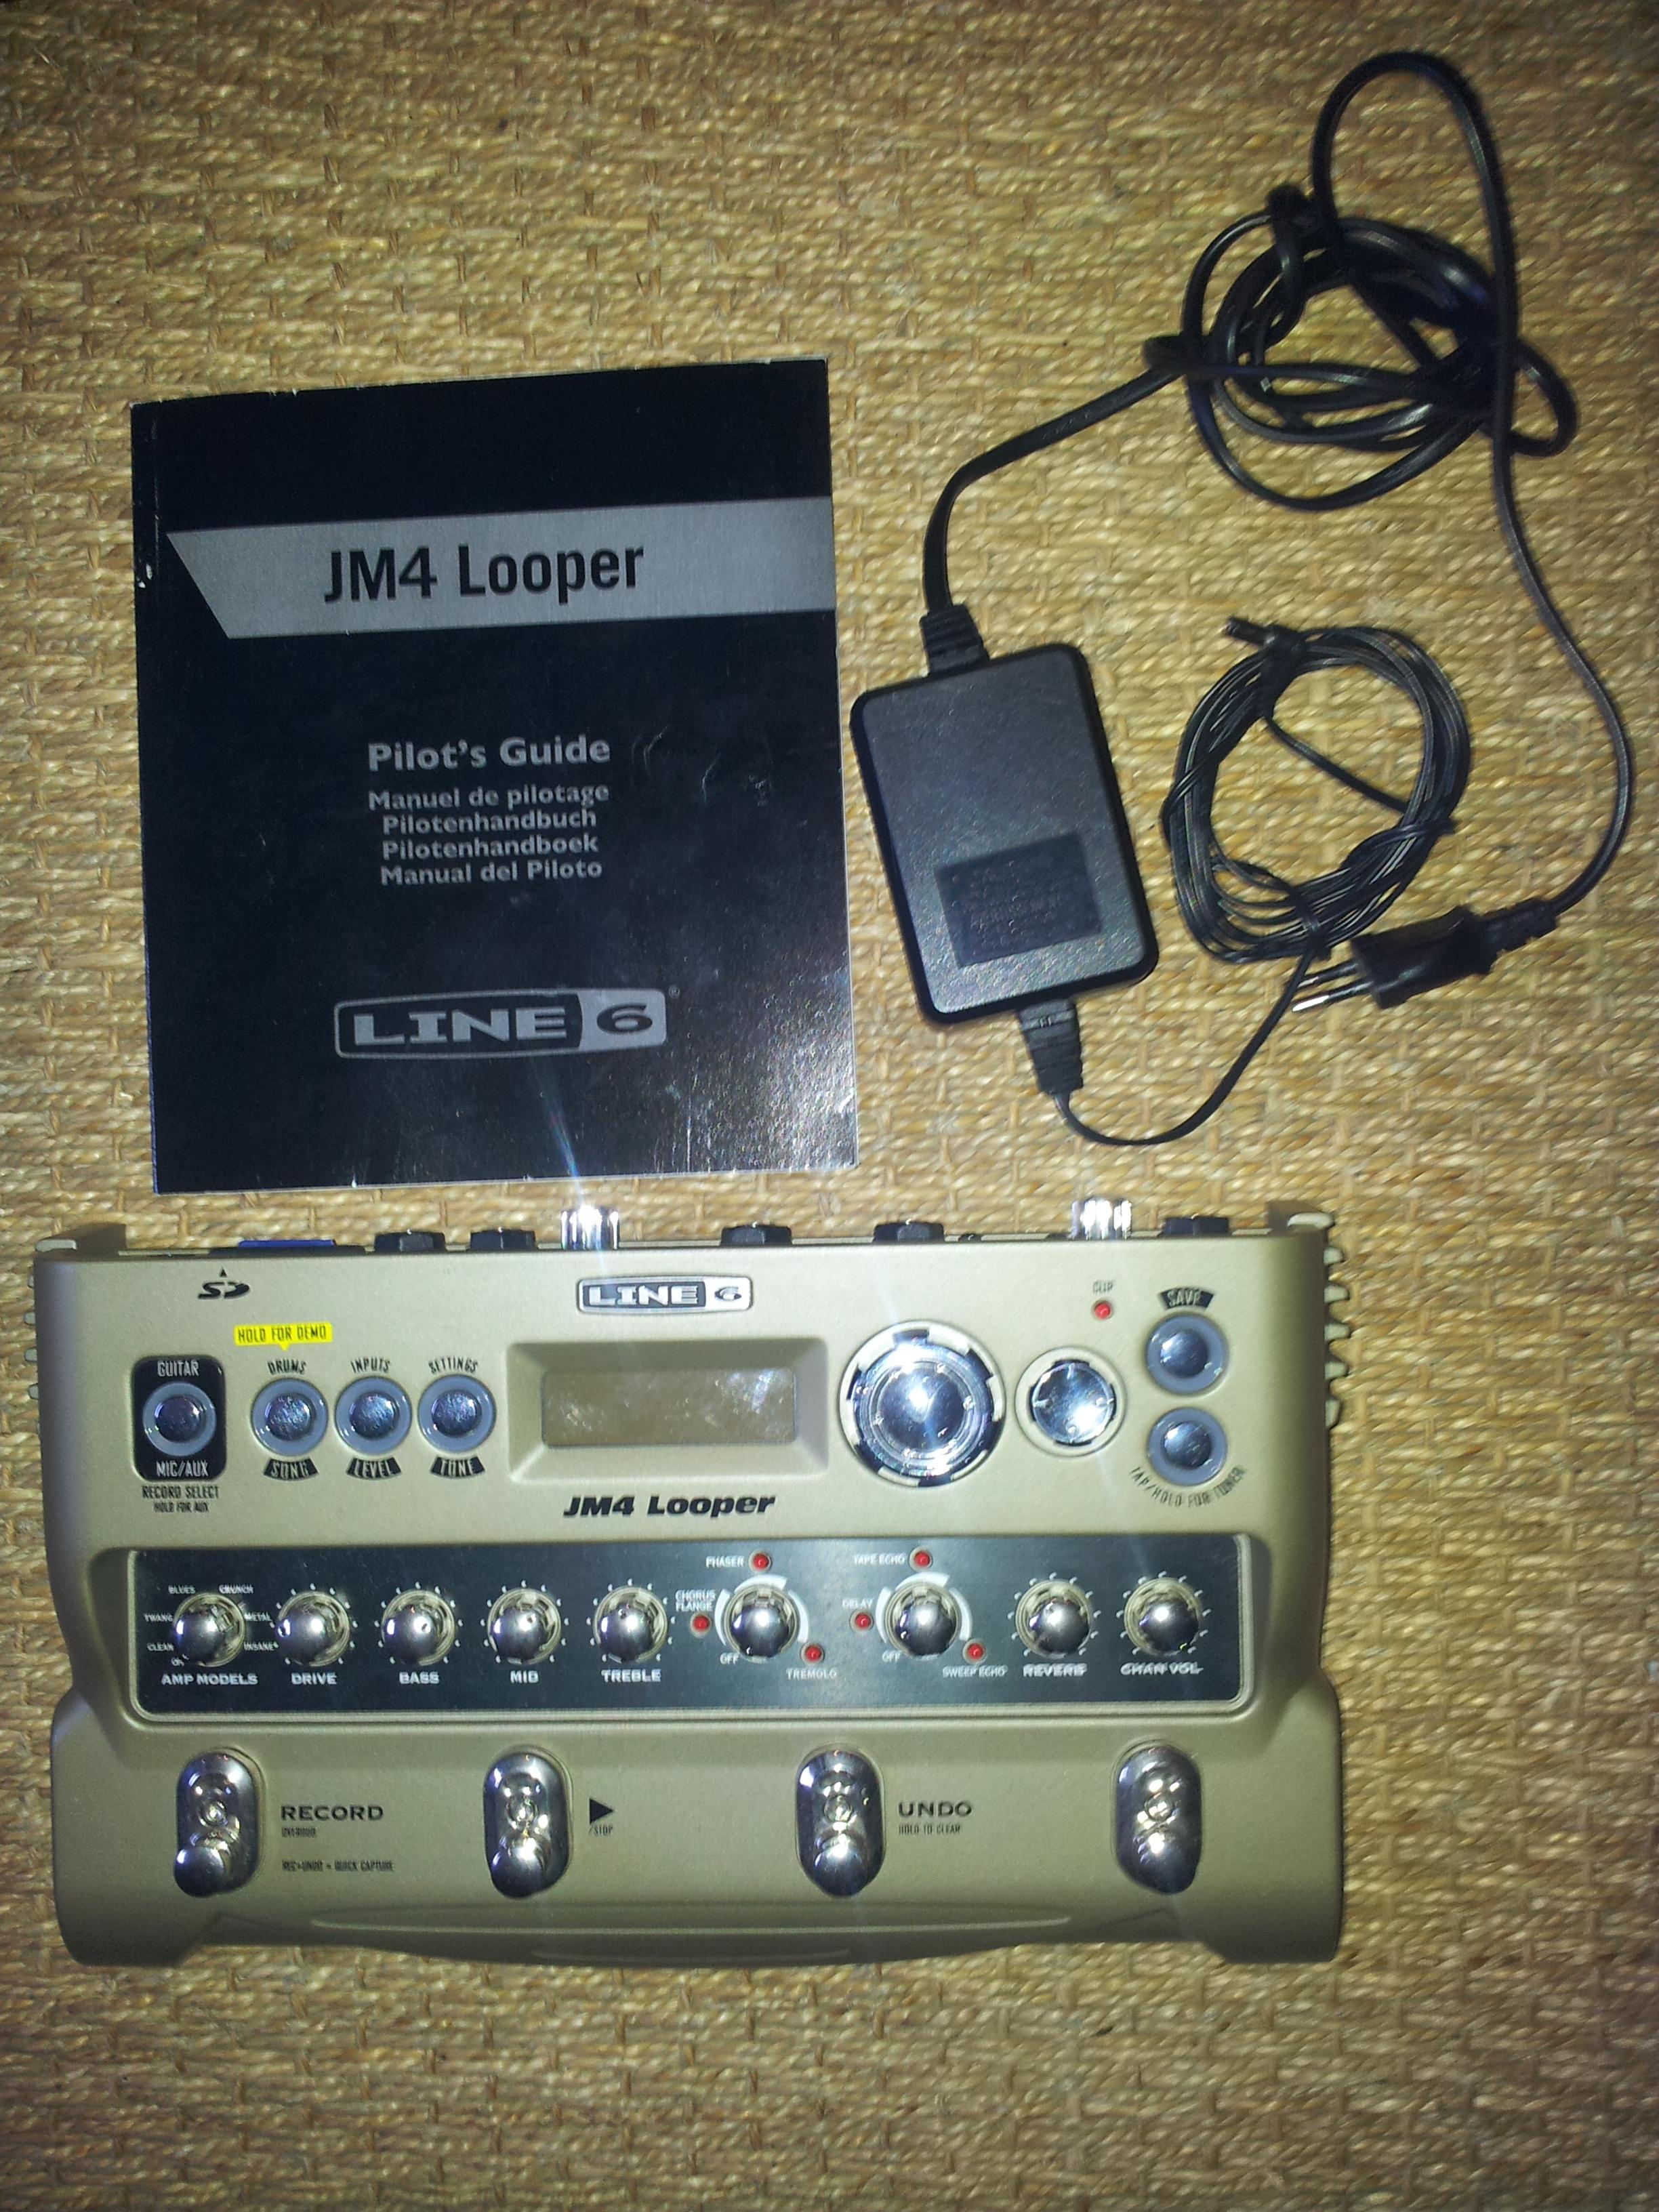 line 6 jm4 looper image 417637 audiofanzine rh en audiofanzine com Line 6 JM4 Looper Review Line 6 JM4 Looper Guitar Effects Pedal